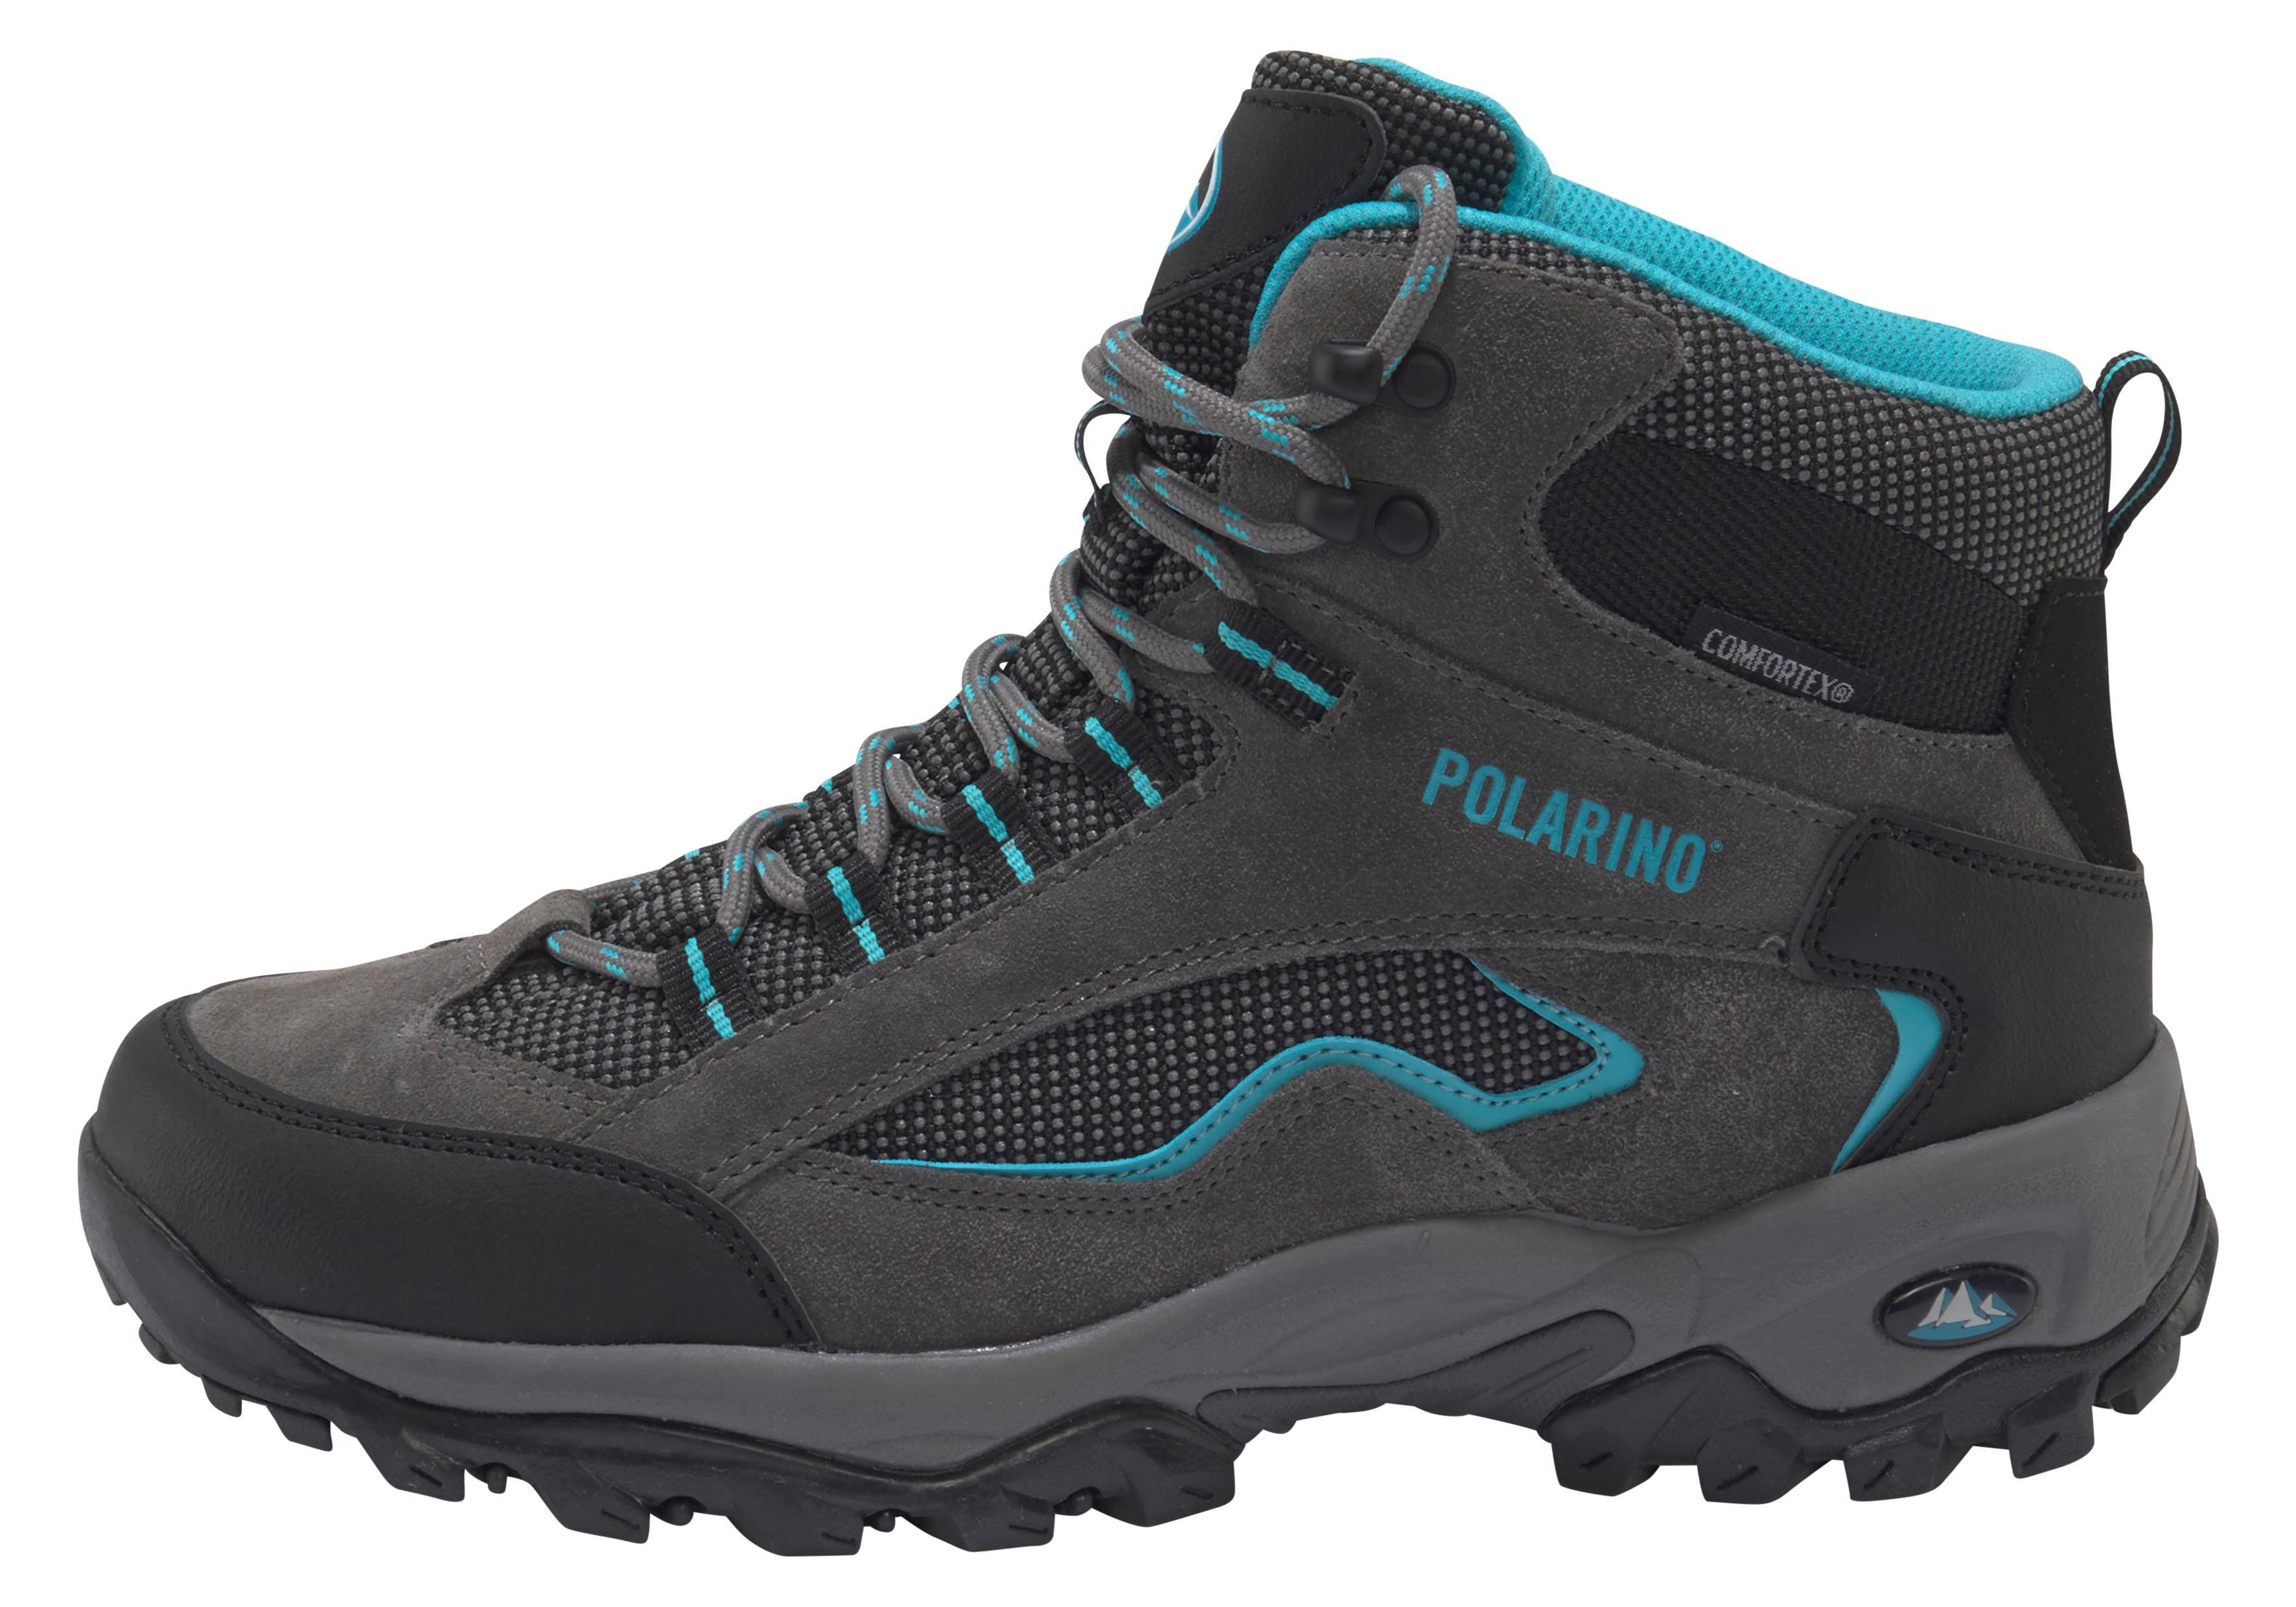 Polarino Outdoorschuh Visionary High Cut   Schuhe > Outdoorschuhe > Trekkingschuhe   Grau   Polarino